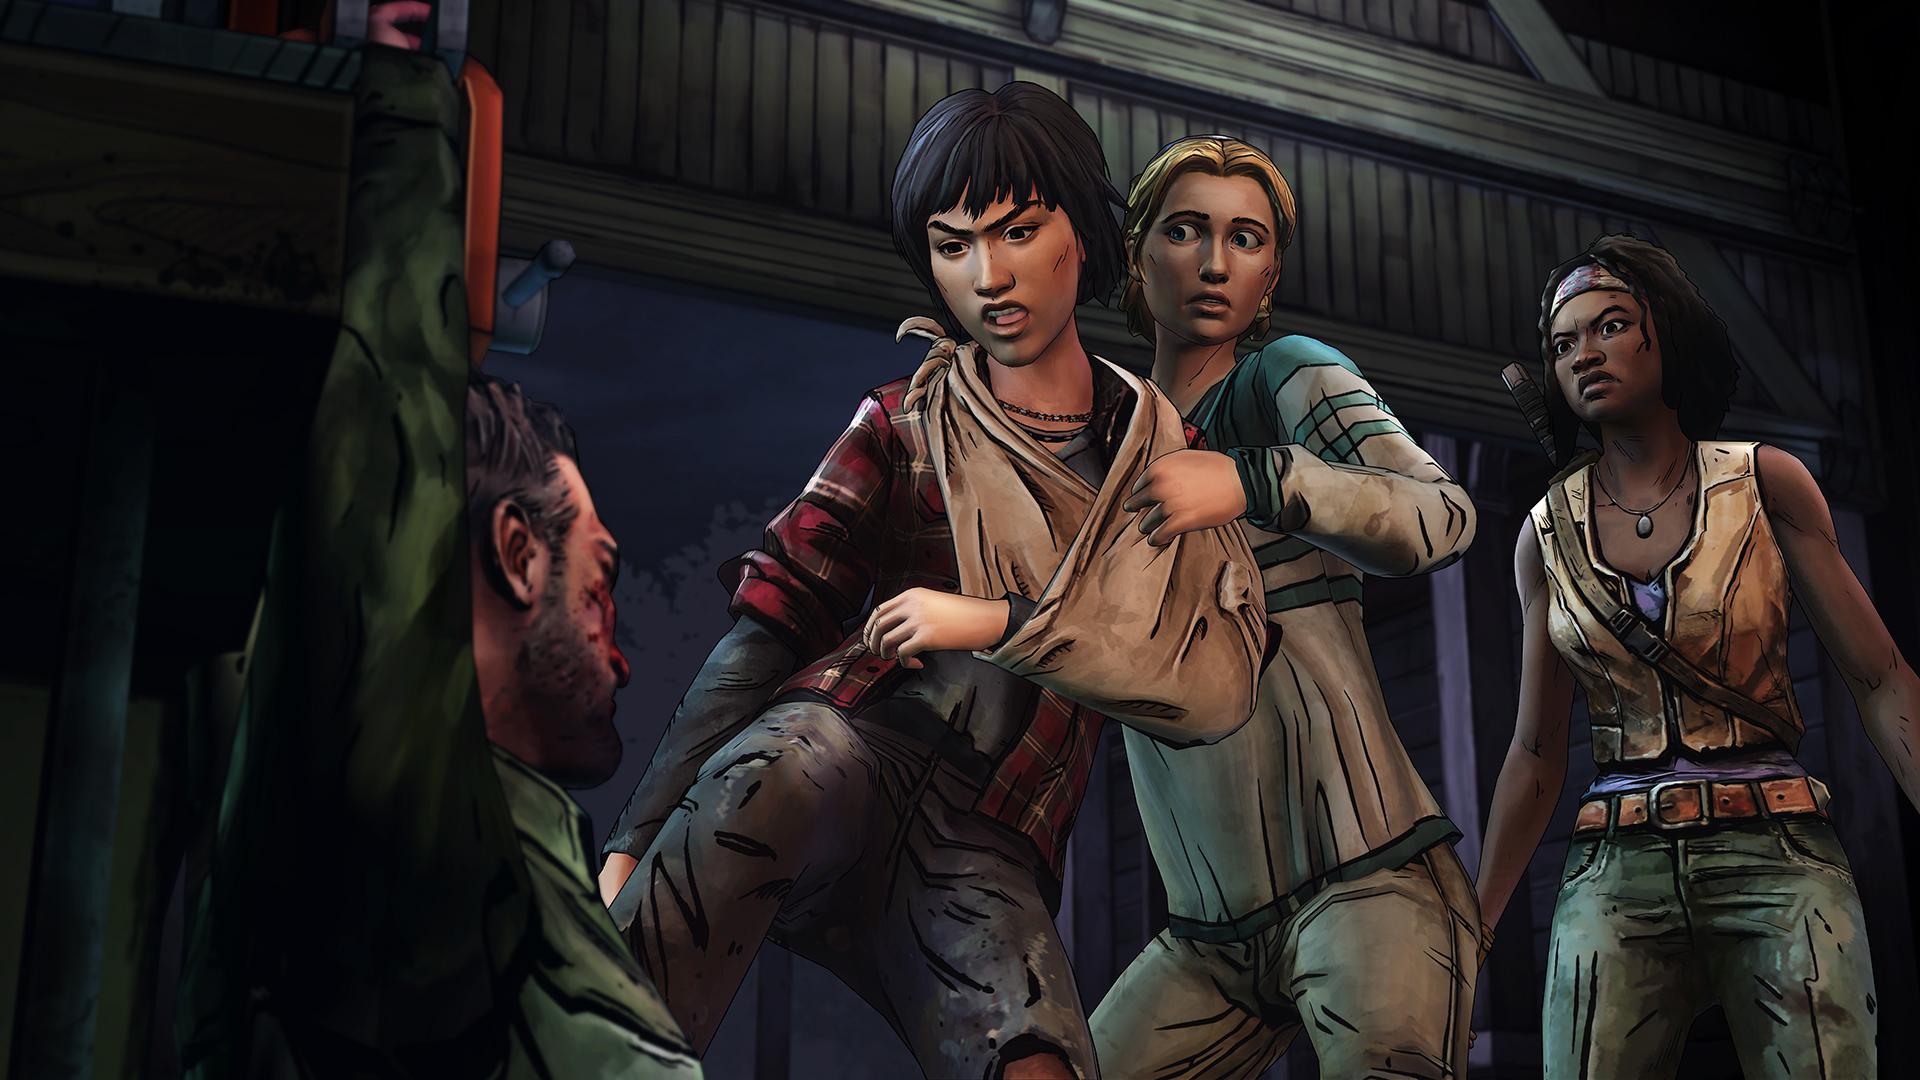 The Walking Dead Michonne Episode 3 What We Deserve Review Screenshot 3